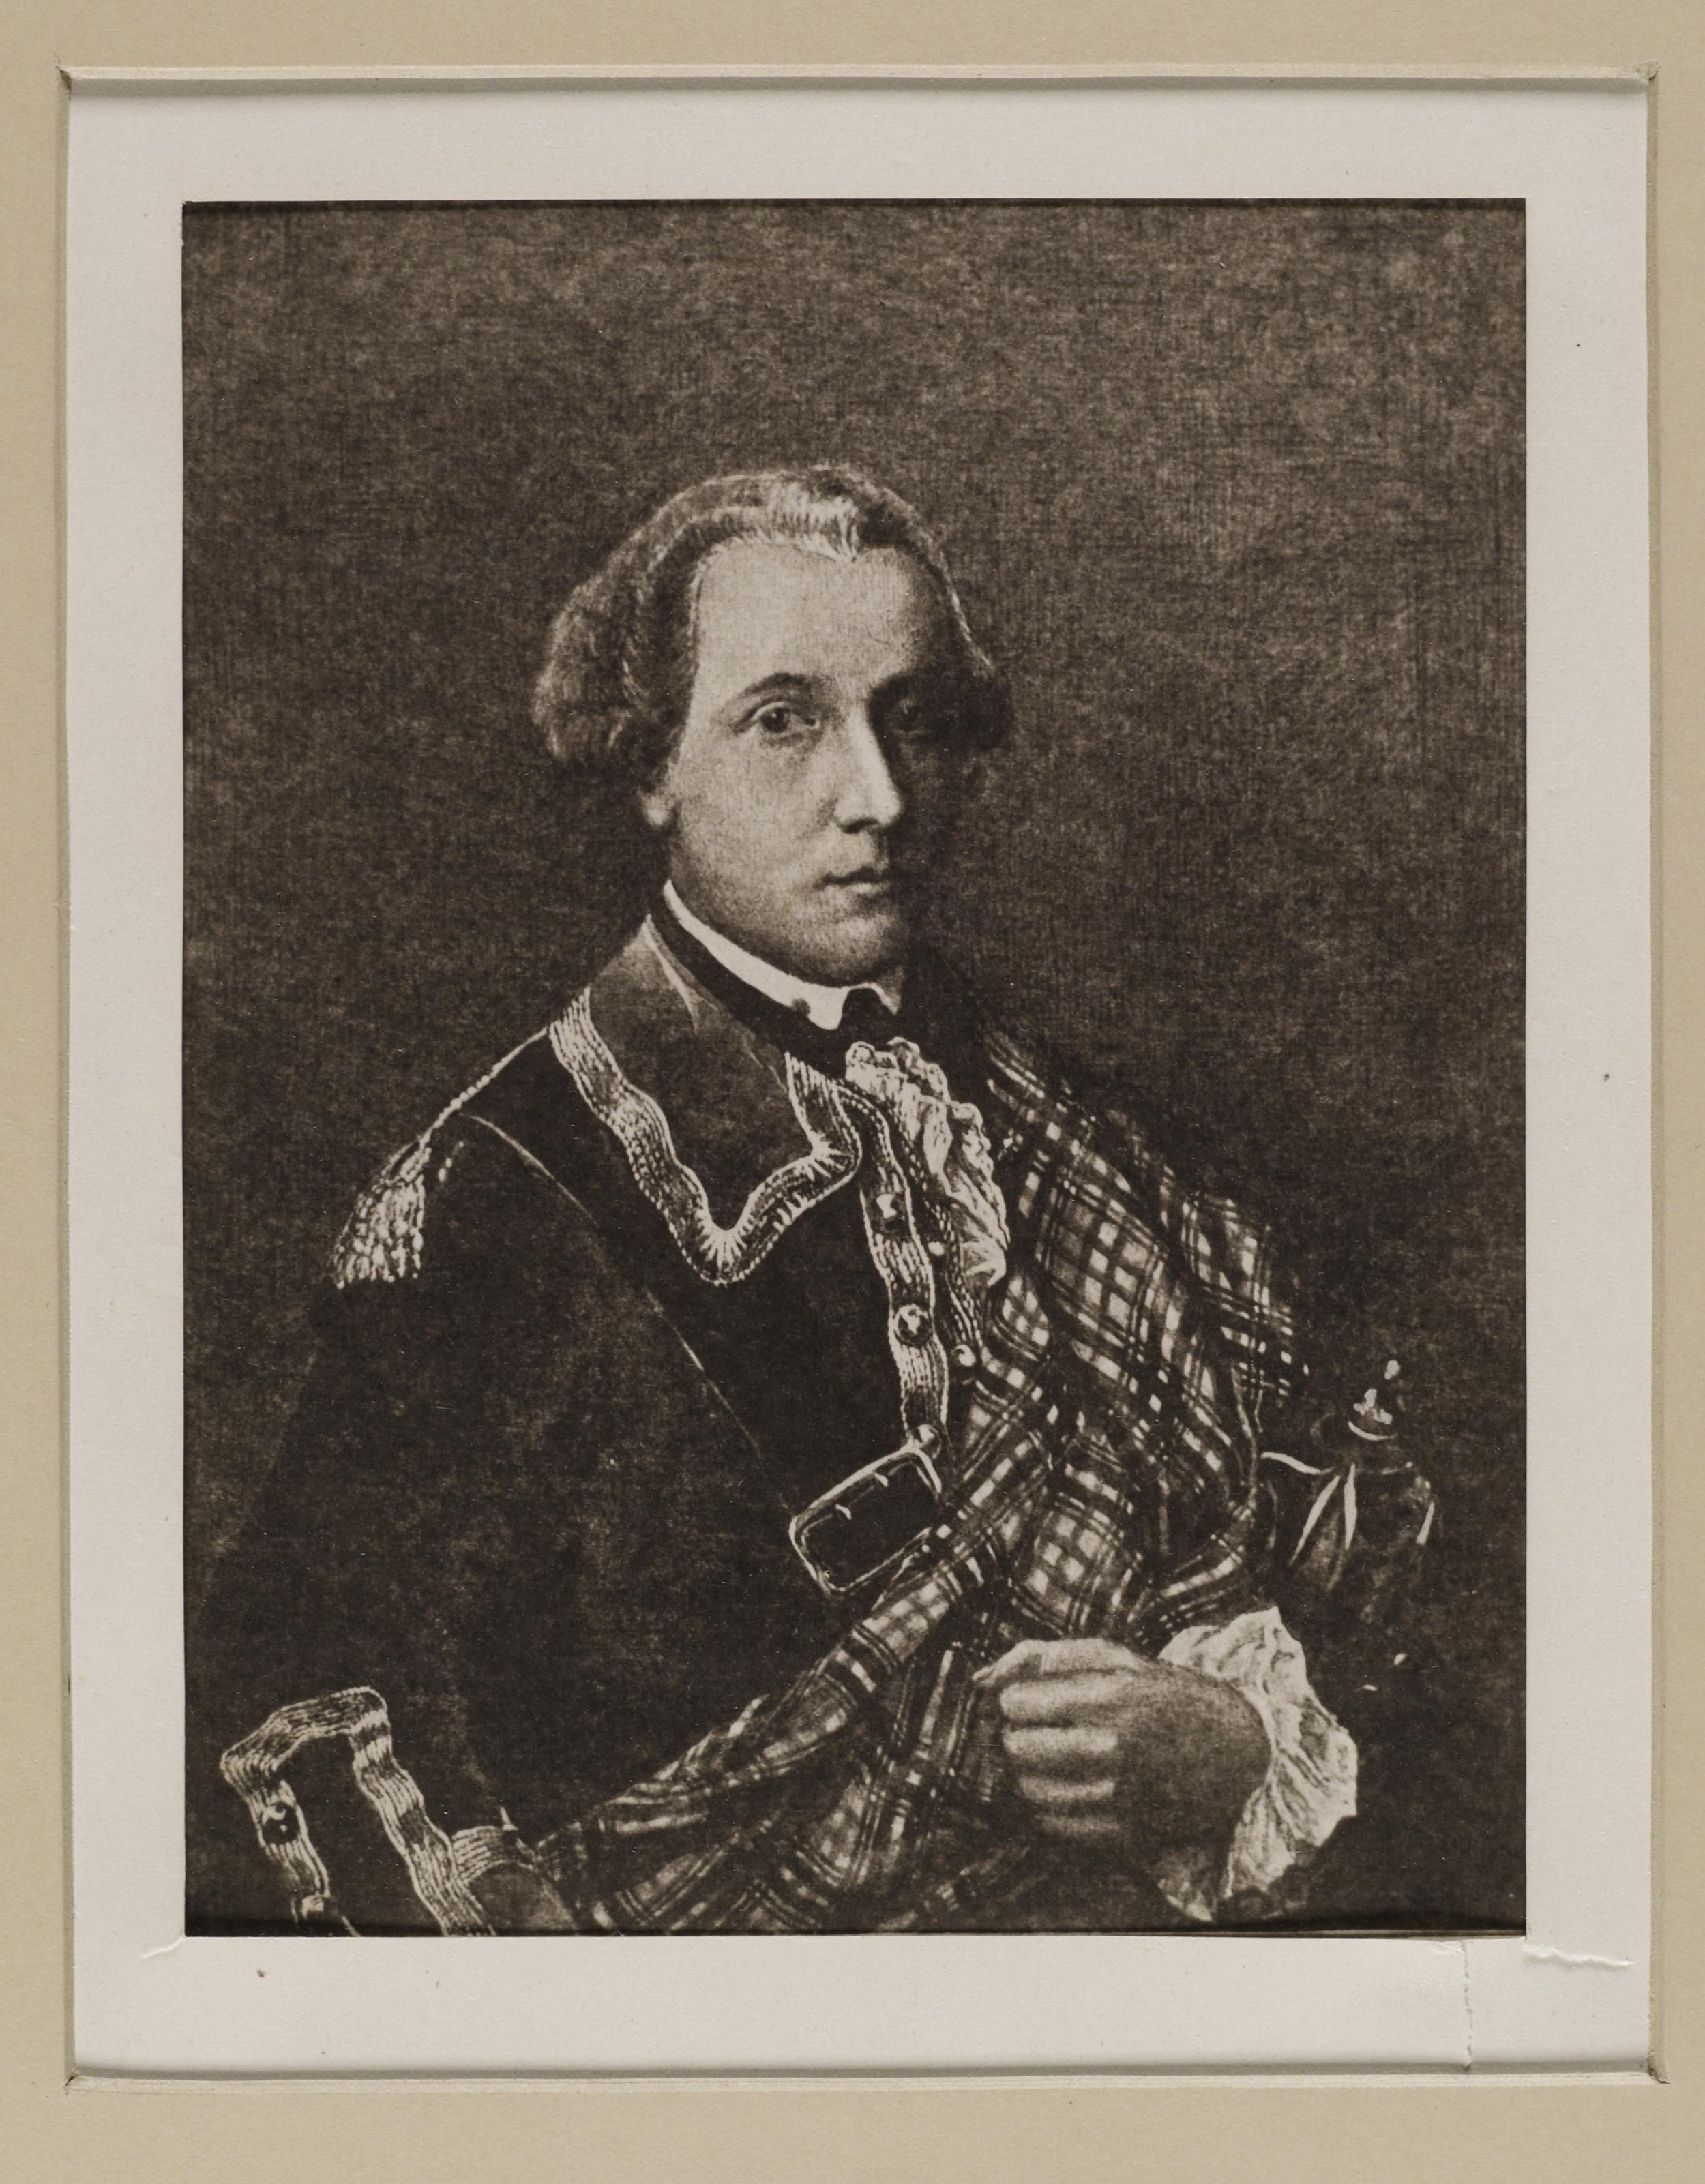 File:Jacobite broadside - Portrait of Donald CAMERON, the Gentle Lochiel ( 1695-